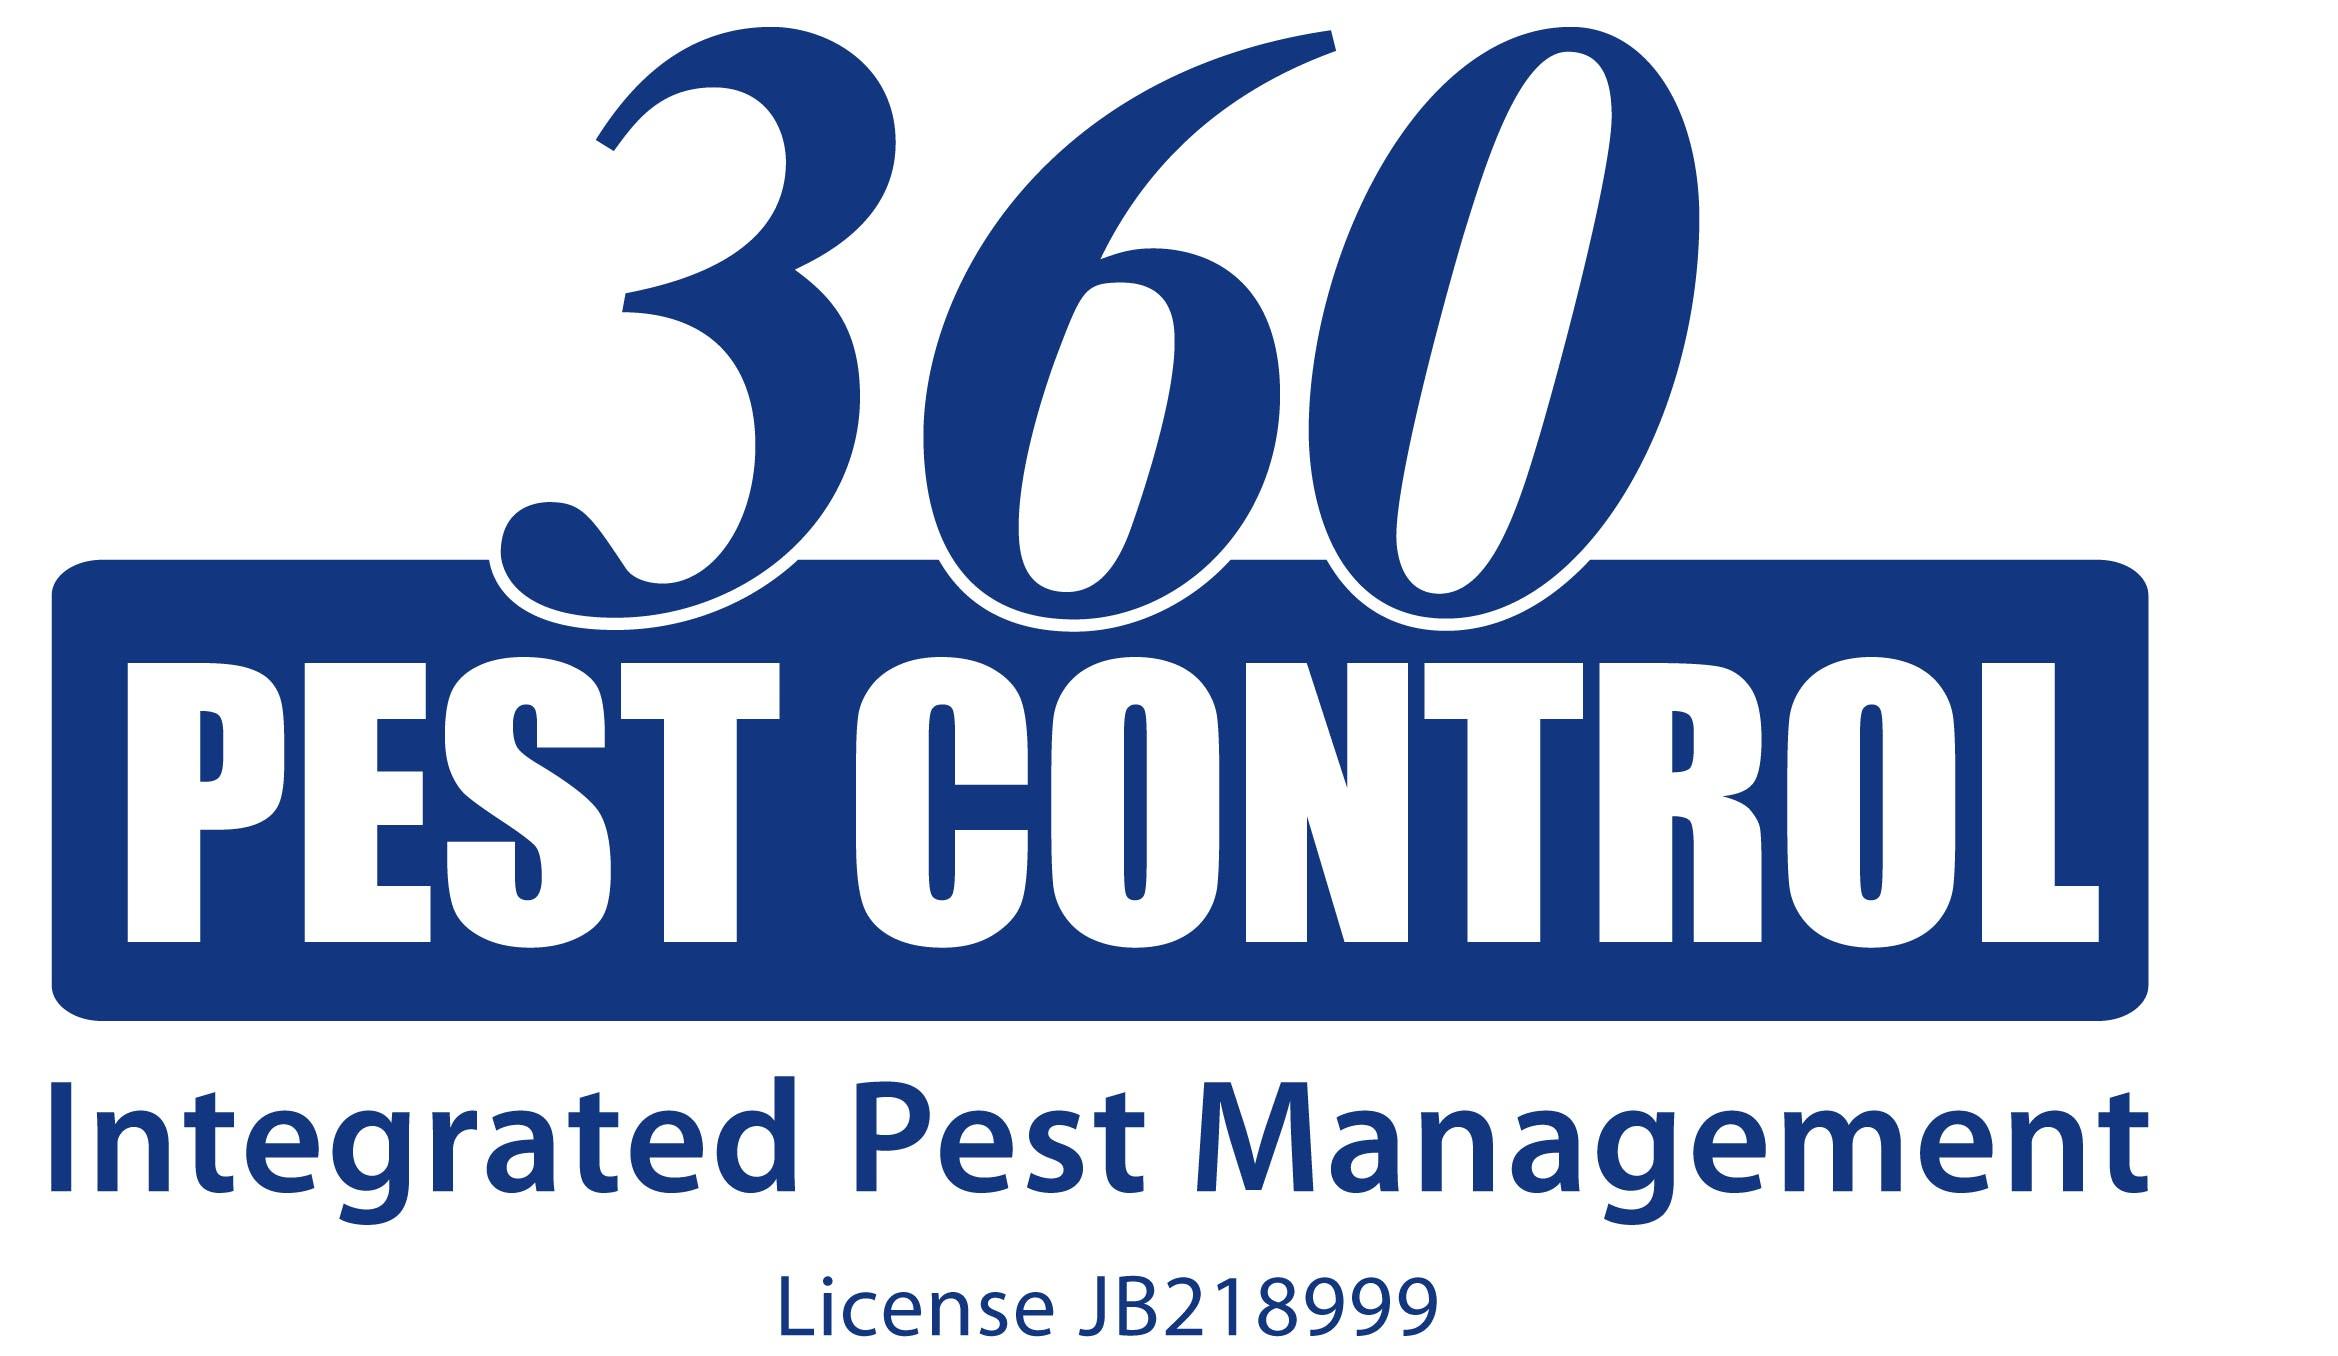 360 pestcontrol with license